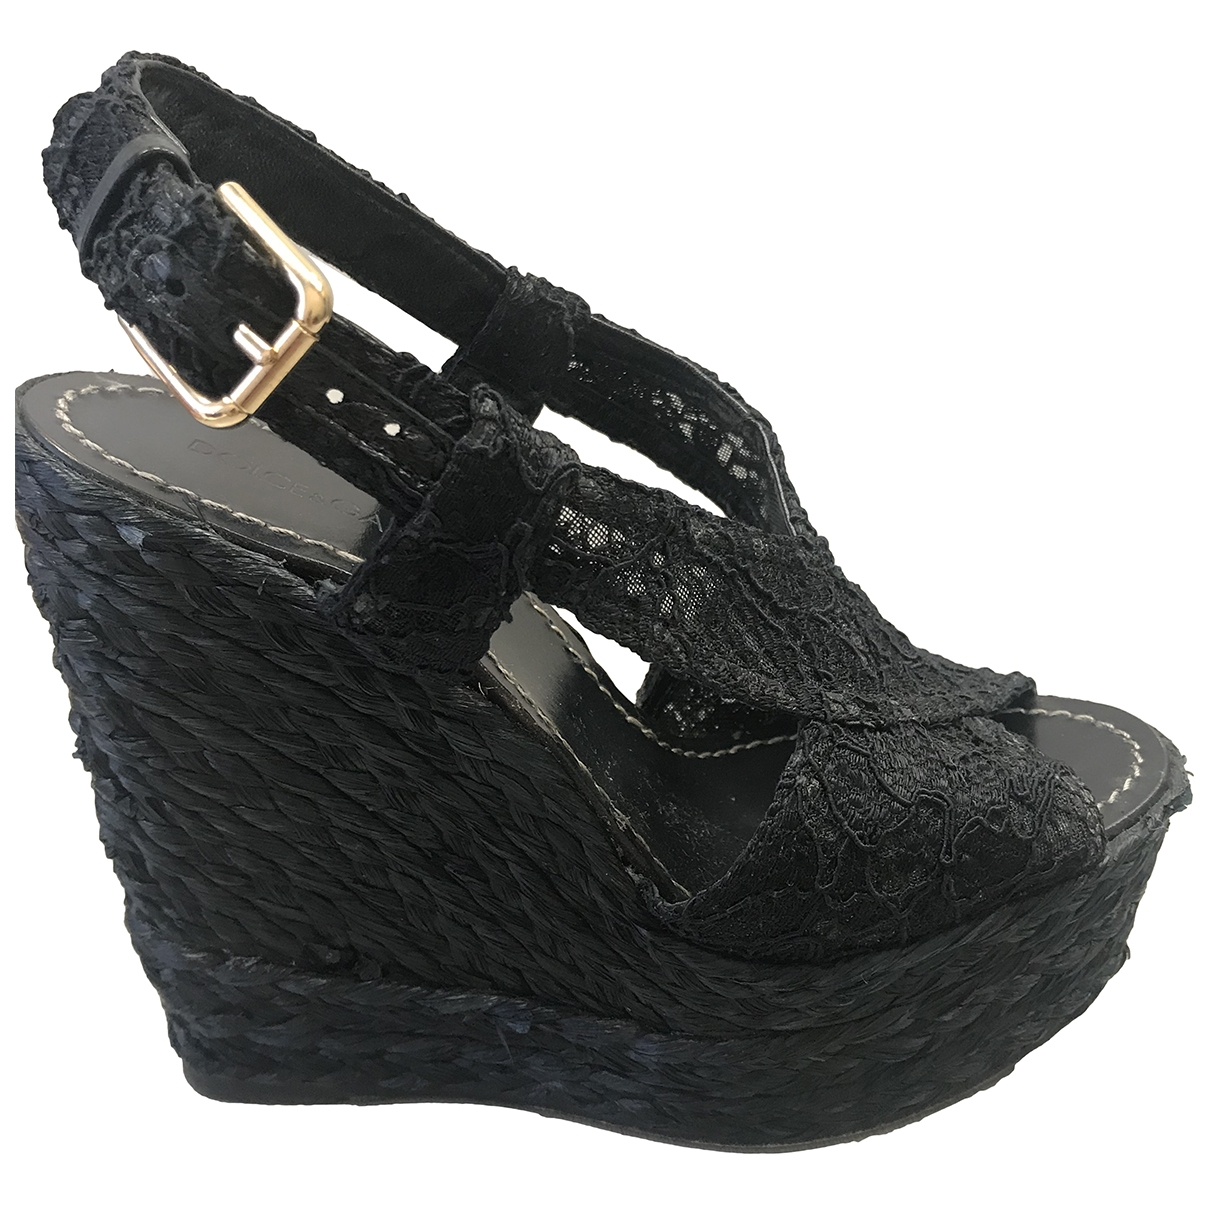 Dolce & Gabbana \N Black Cloth Sandals for Women 35 EU